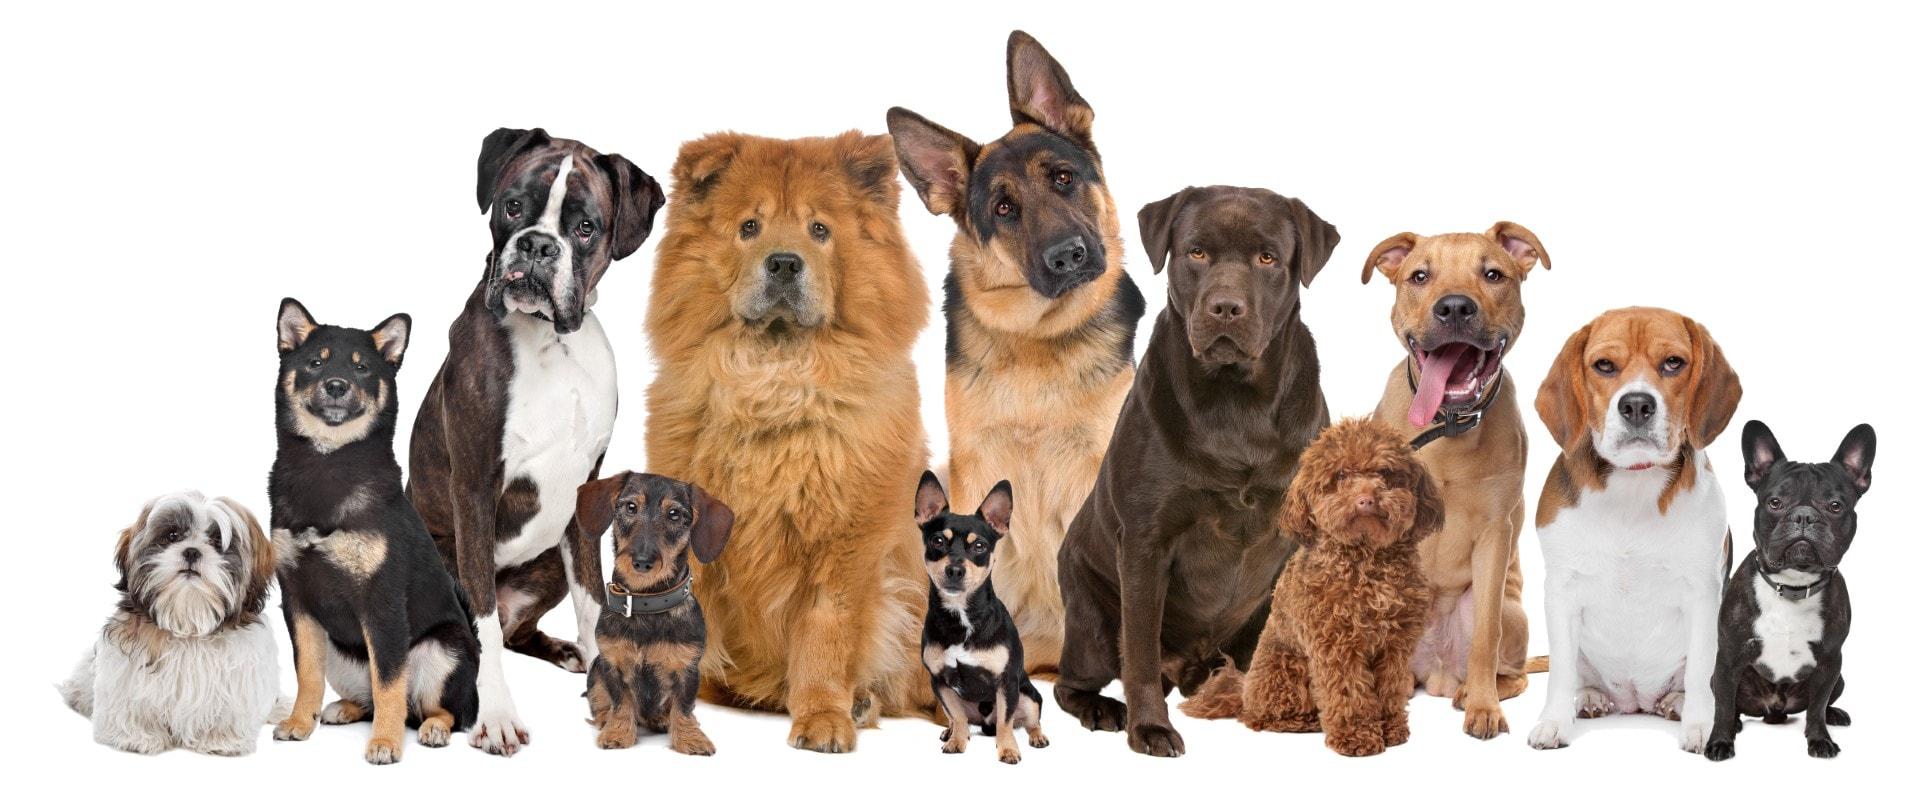 dogs-01.06-Large.jpg